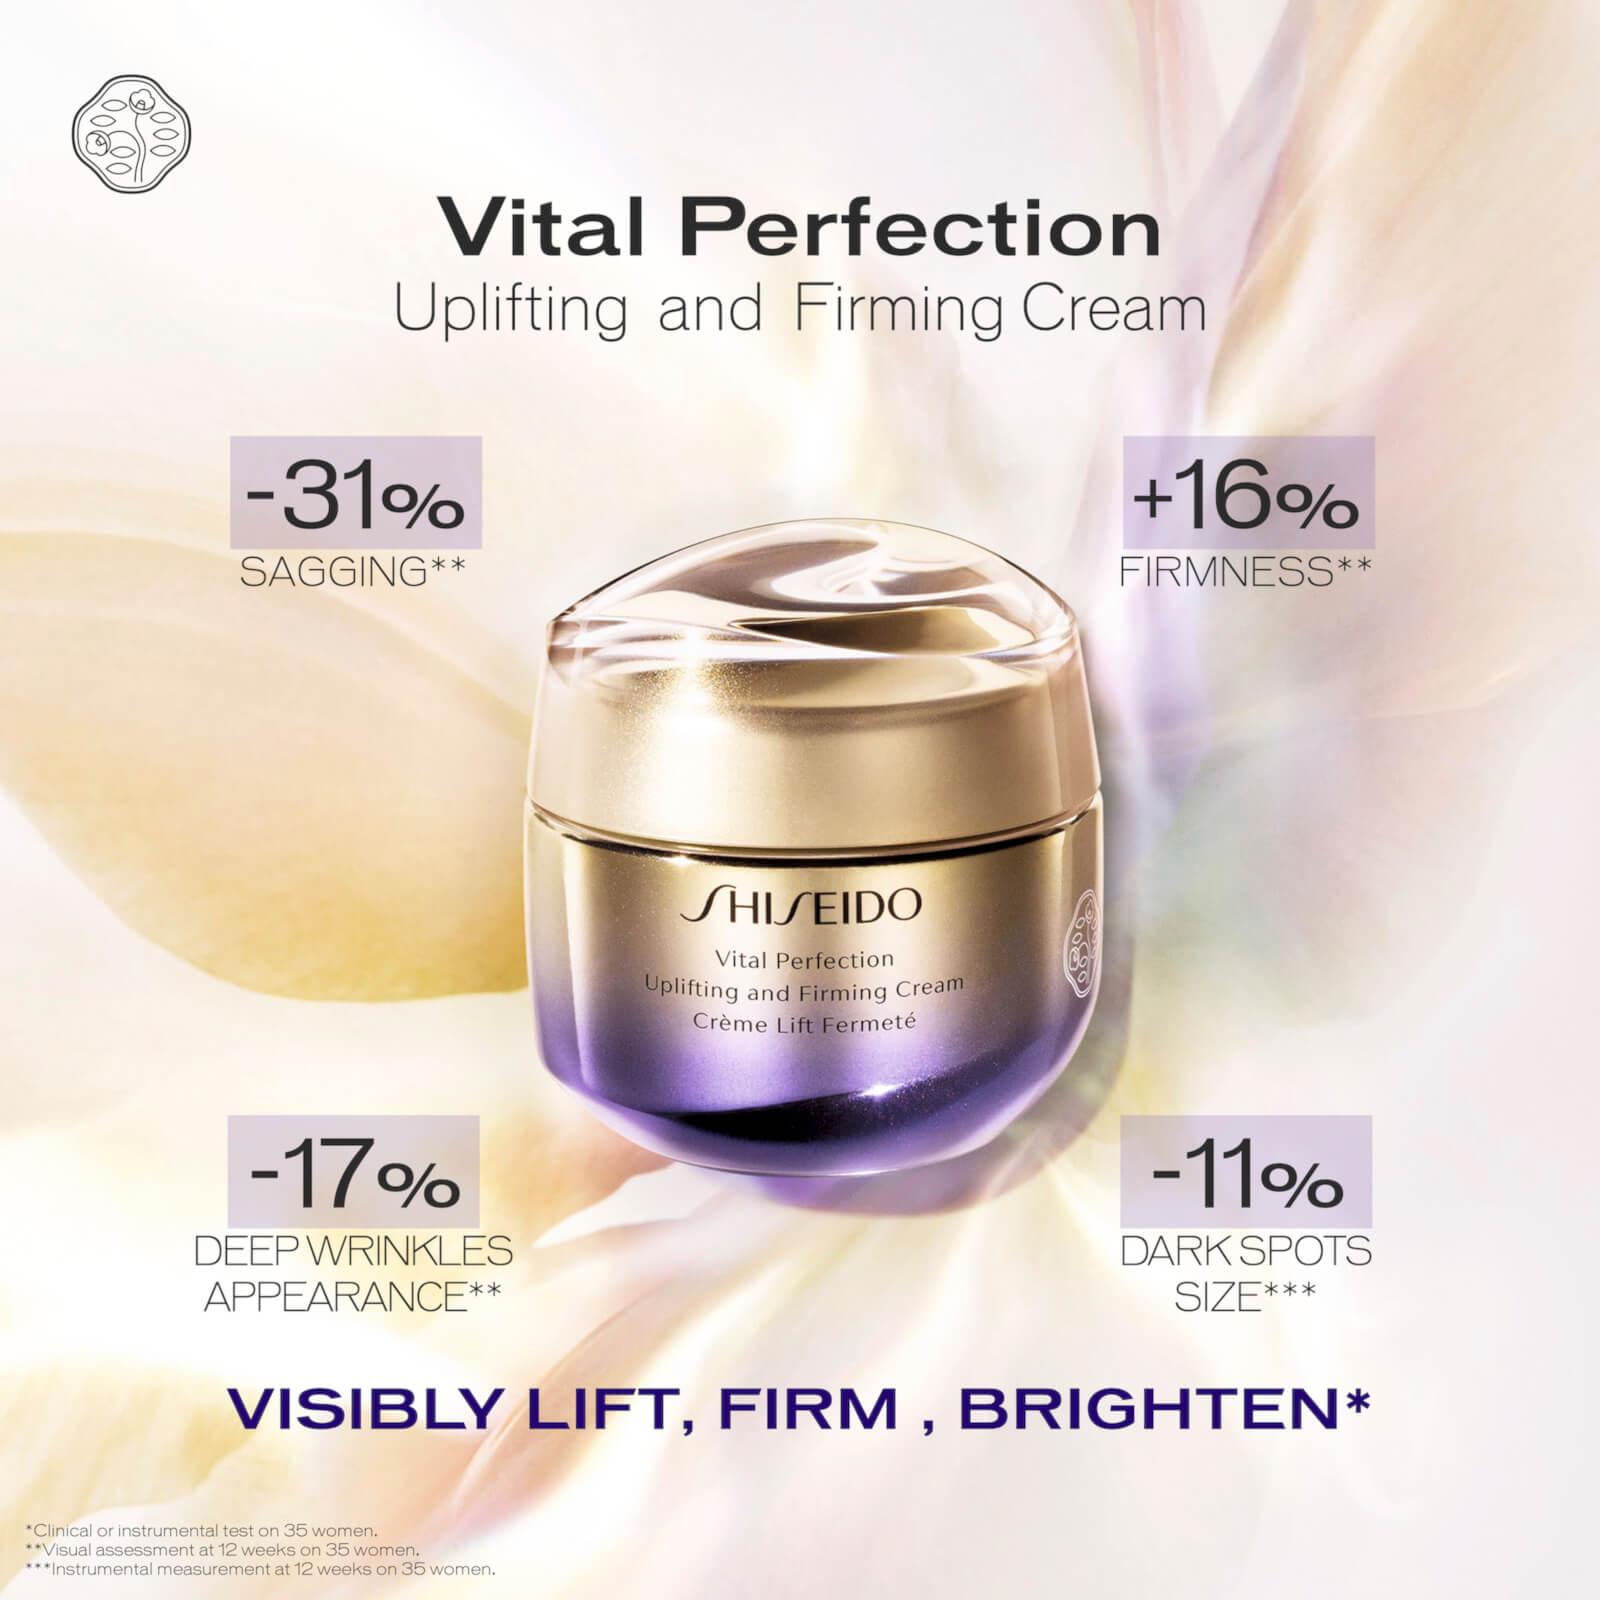 Shiseido 资生堂 Vital Perfection 悦薇珀翡紧致抗皱日霜 SPF30 50ml 优惠码折后海淘免运费直邮到手¥702